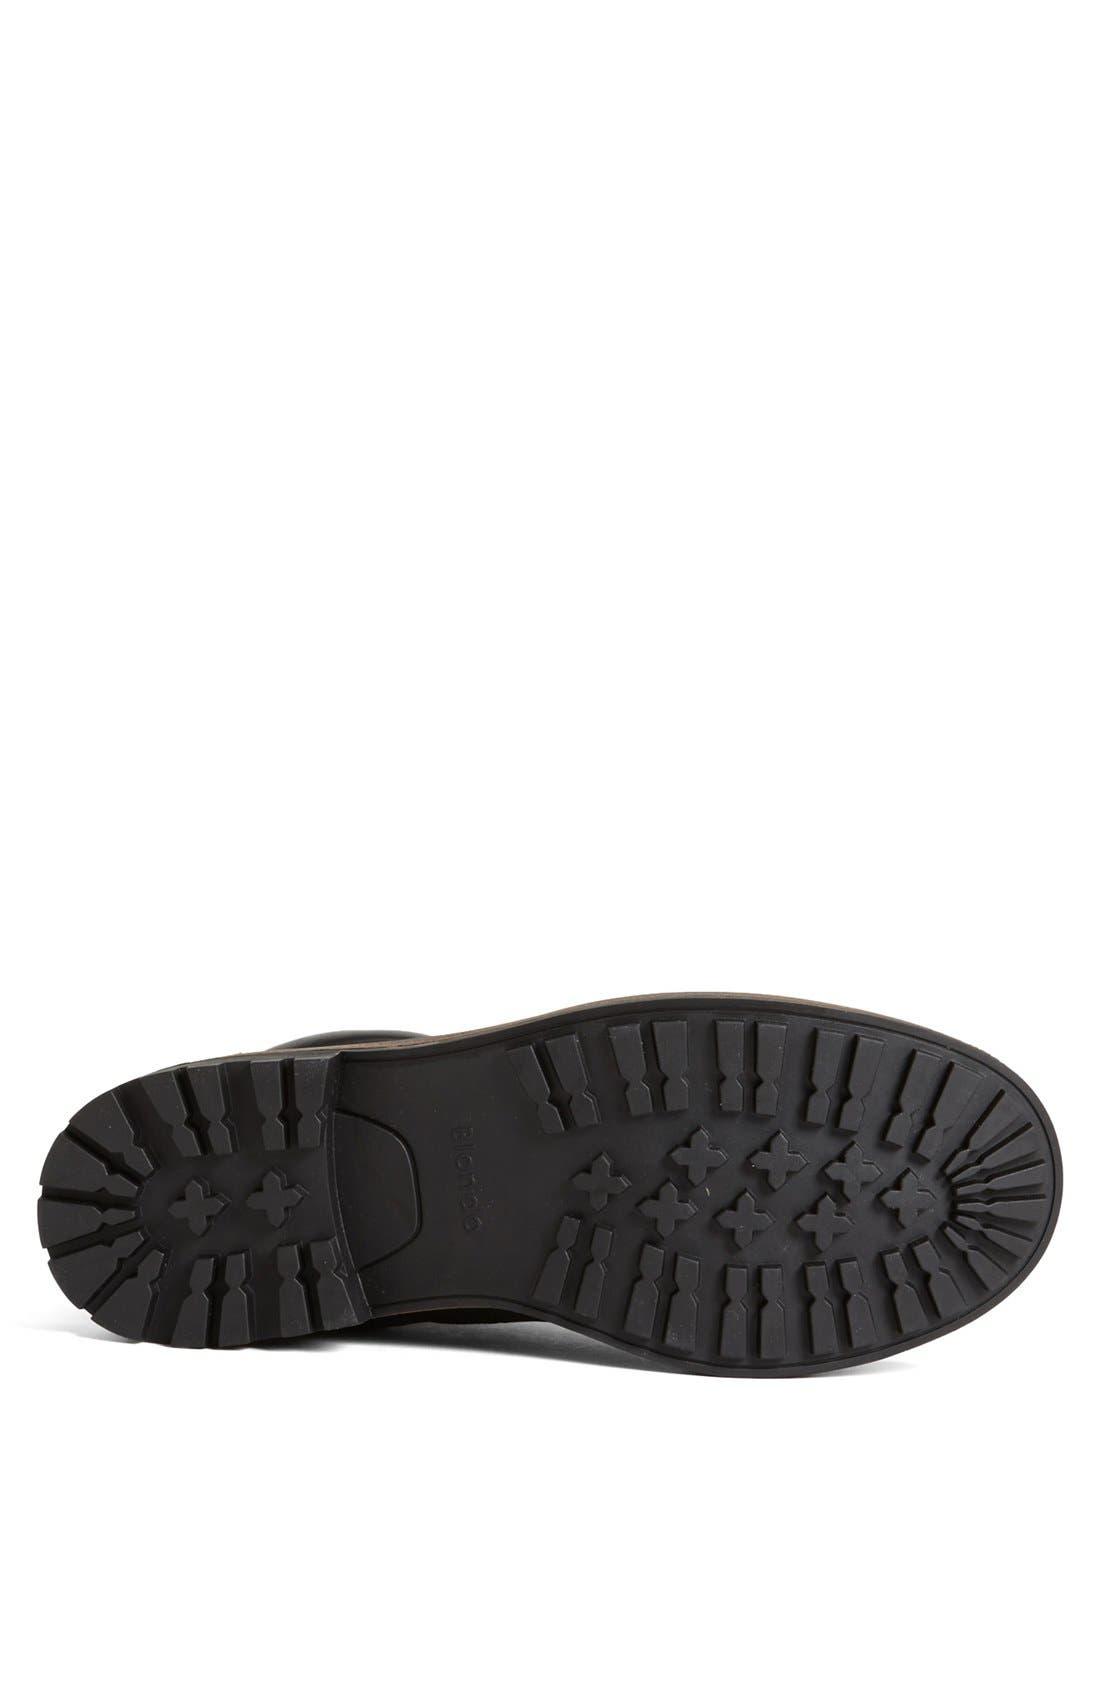 'Jaro' Waterproof Boot,                             Alternate thumbnail 4, color,                             Black